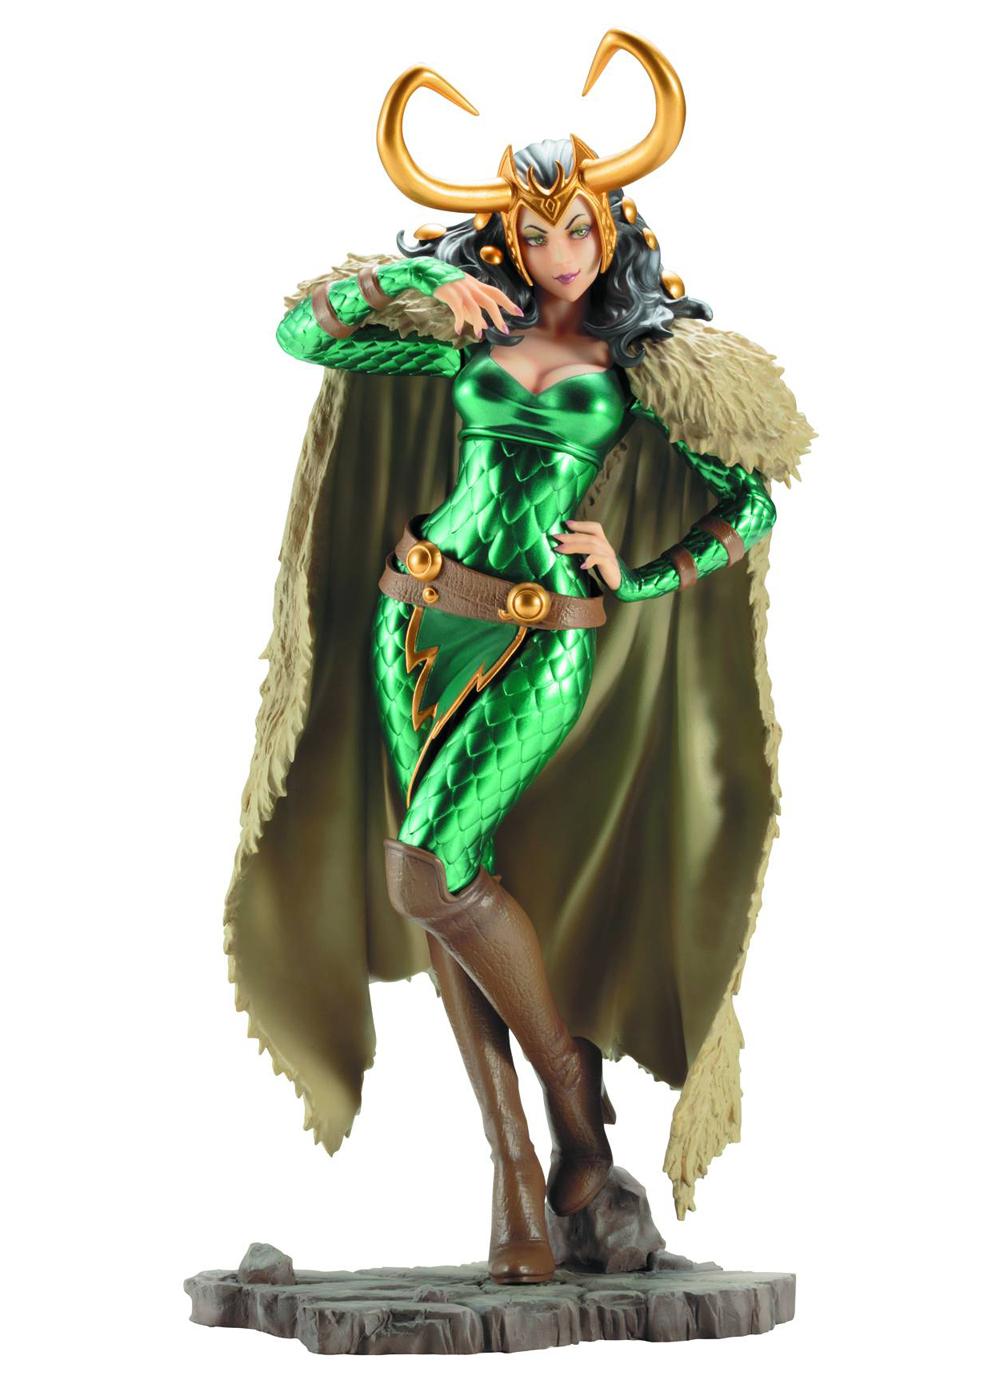 Marvel Lady Loki 1/7 Scale Bishoujo Statue